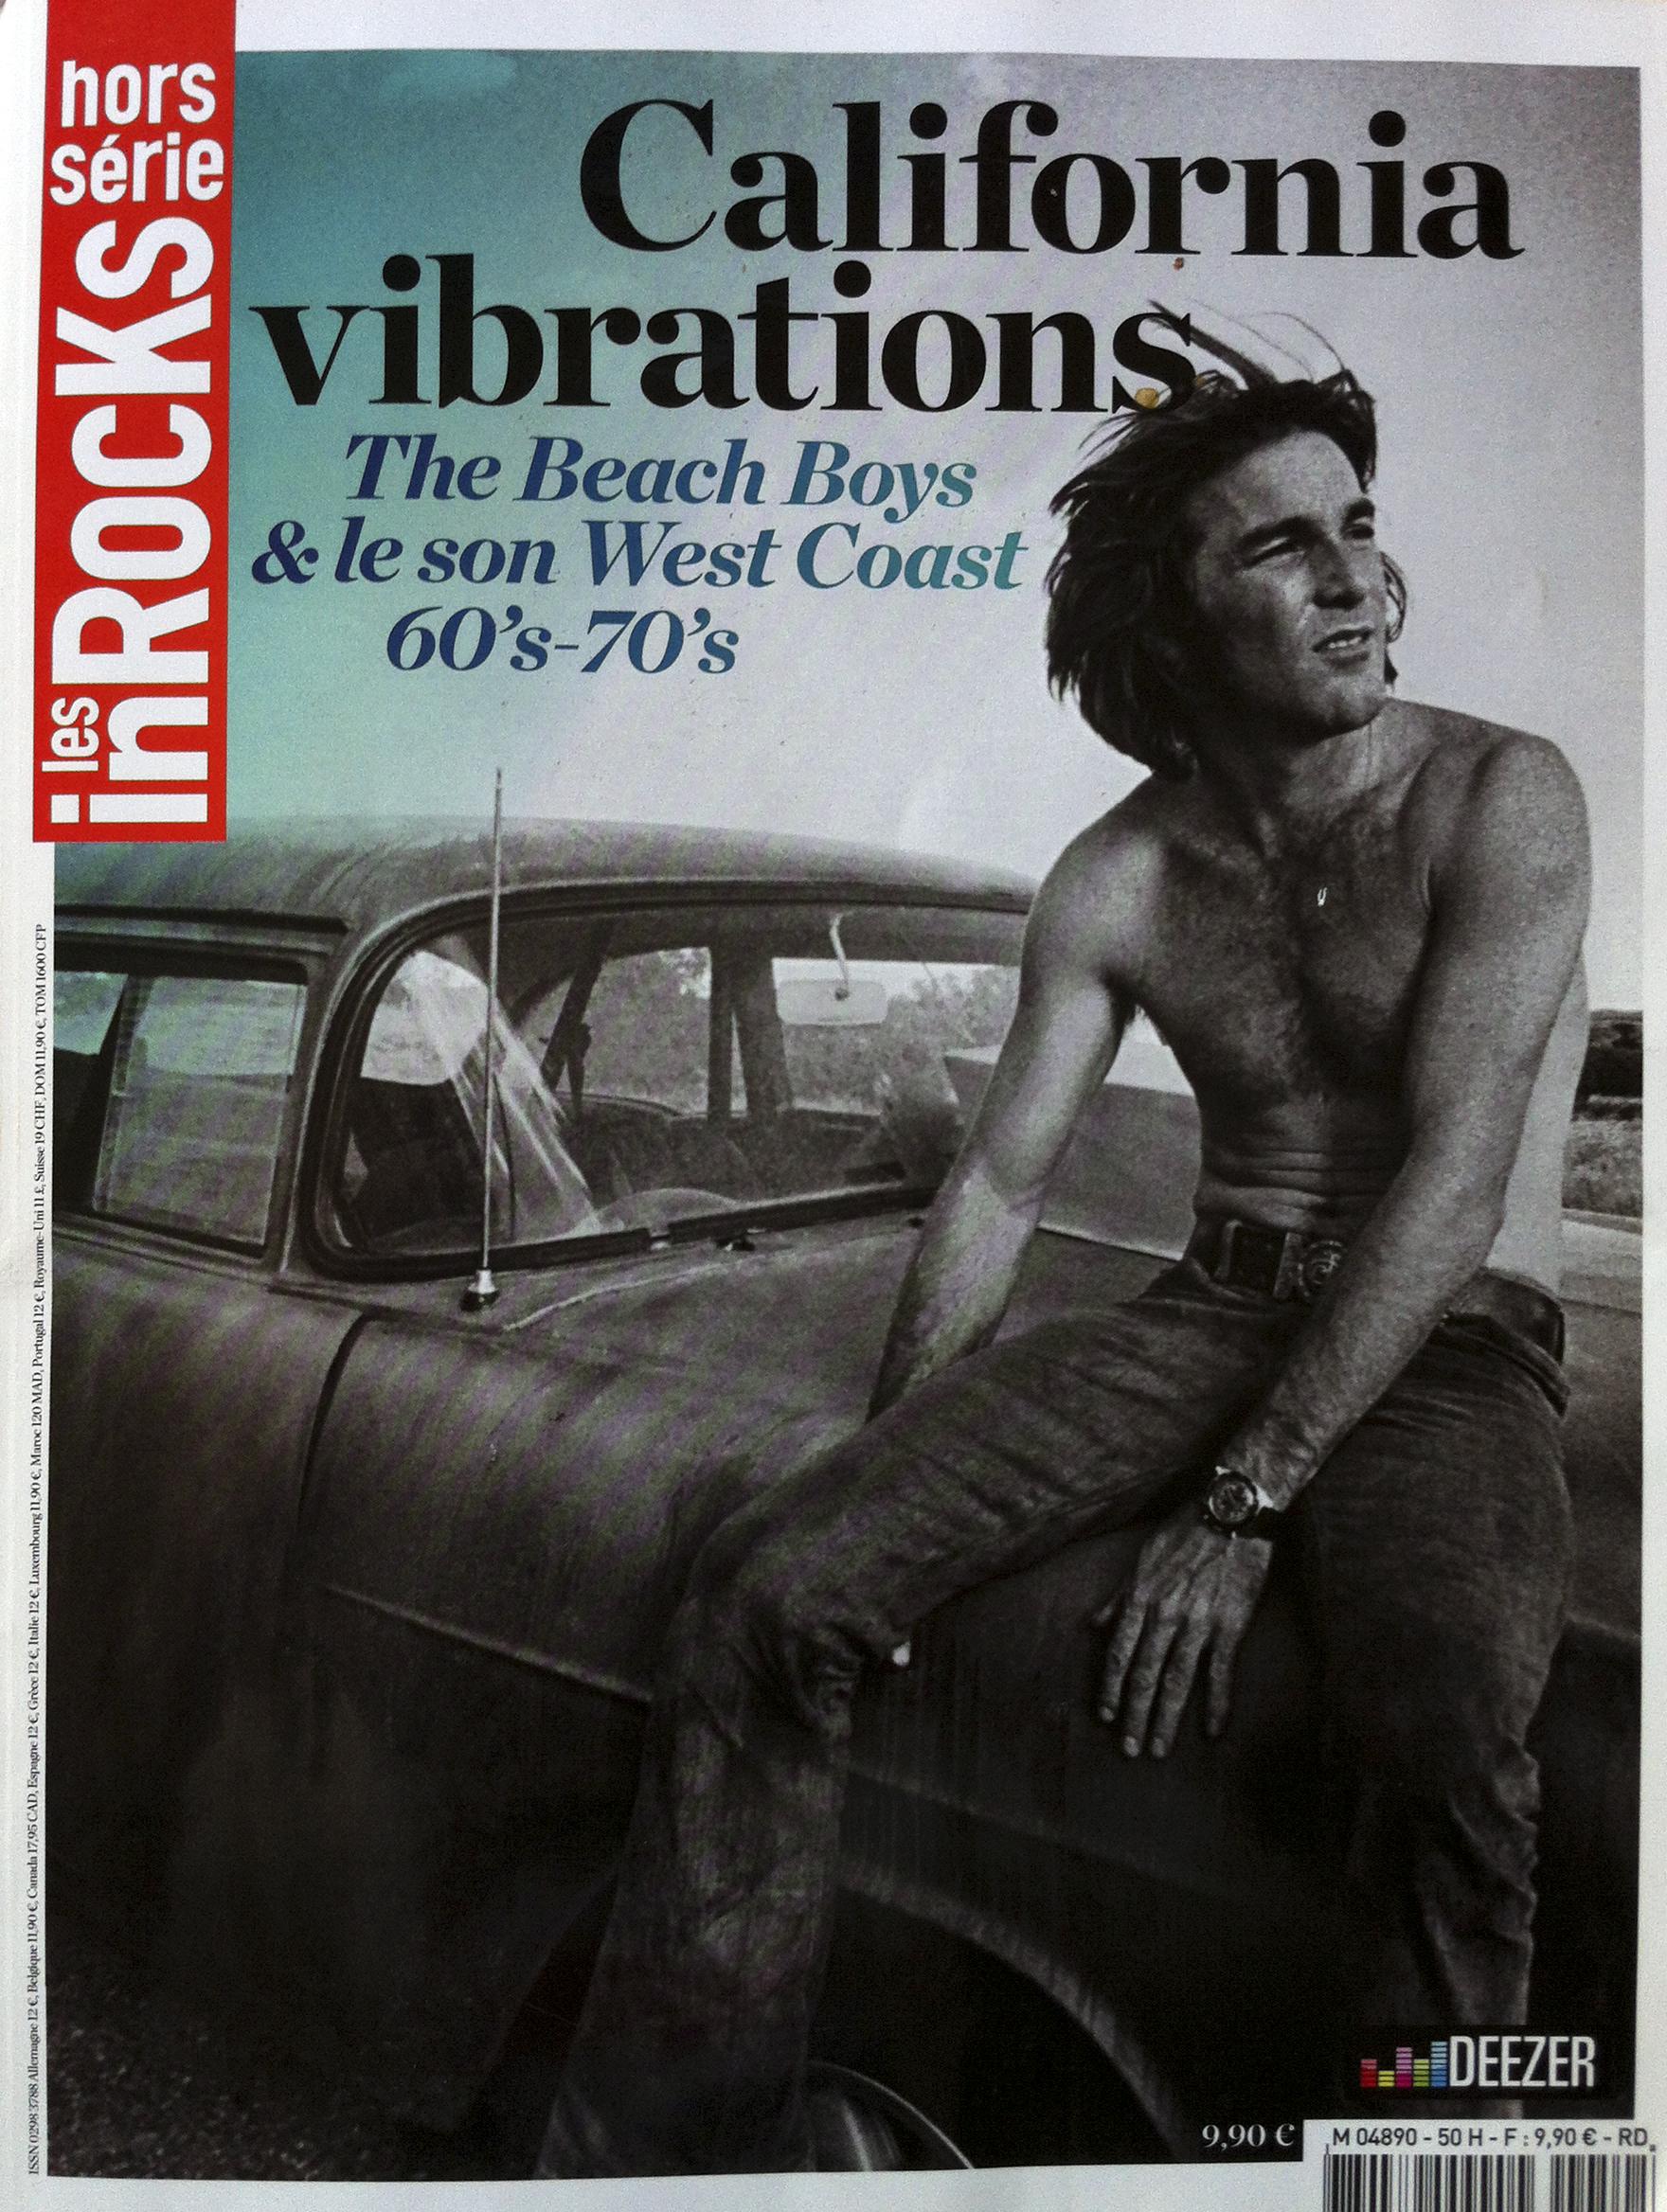 Les Inrocks juin 2011